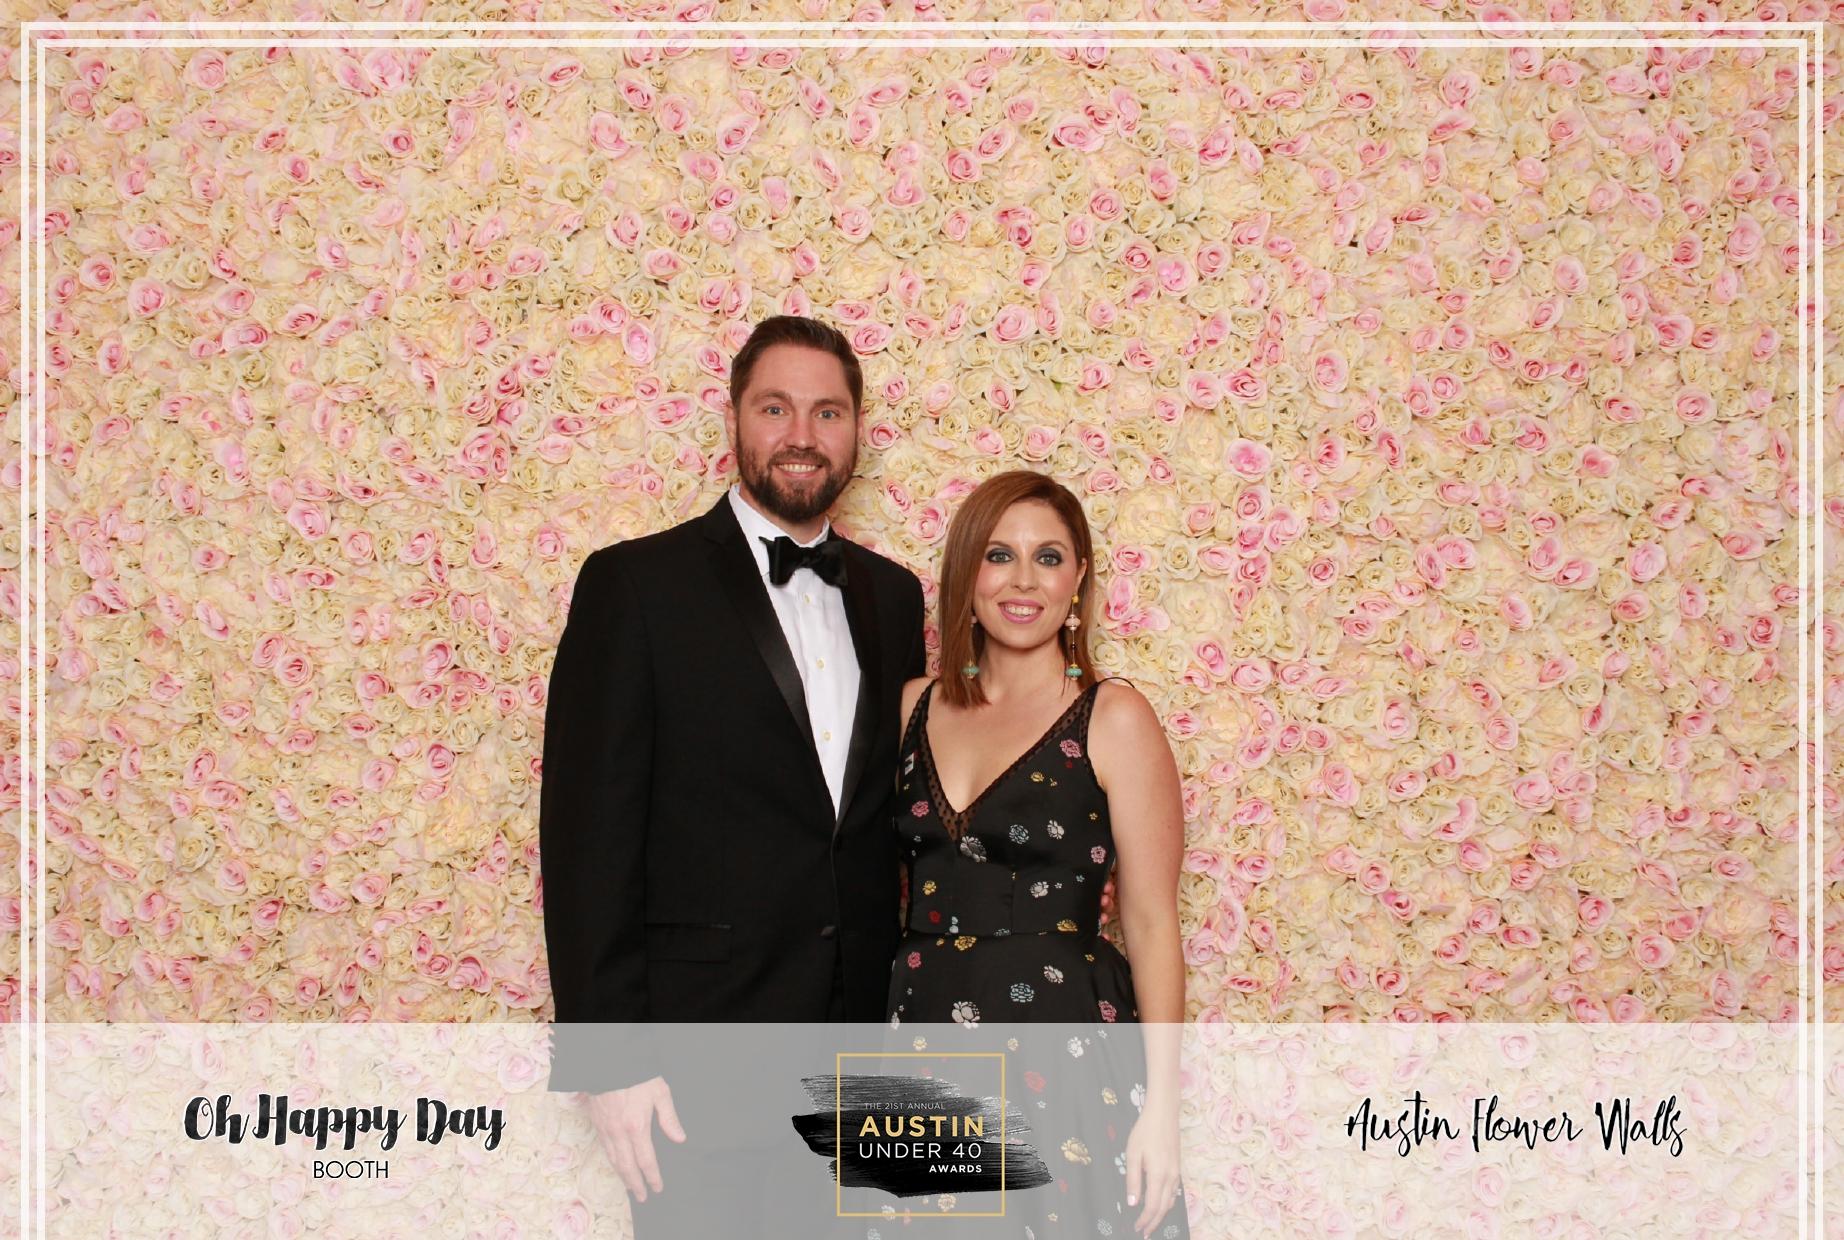 Oh Happy Day Booth - Austin Under 40-29.jpg